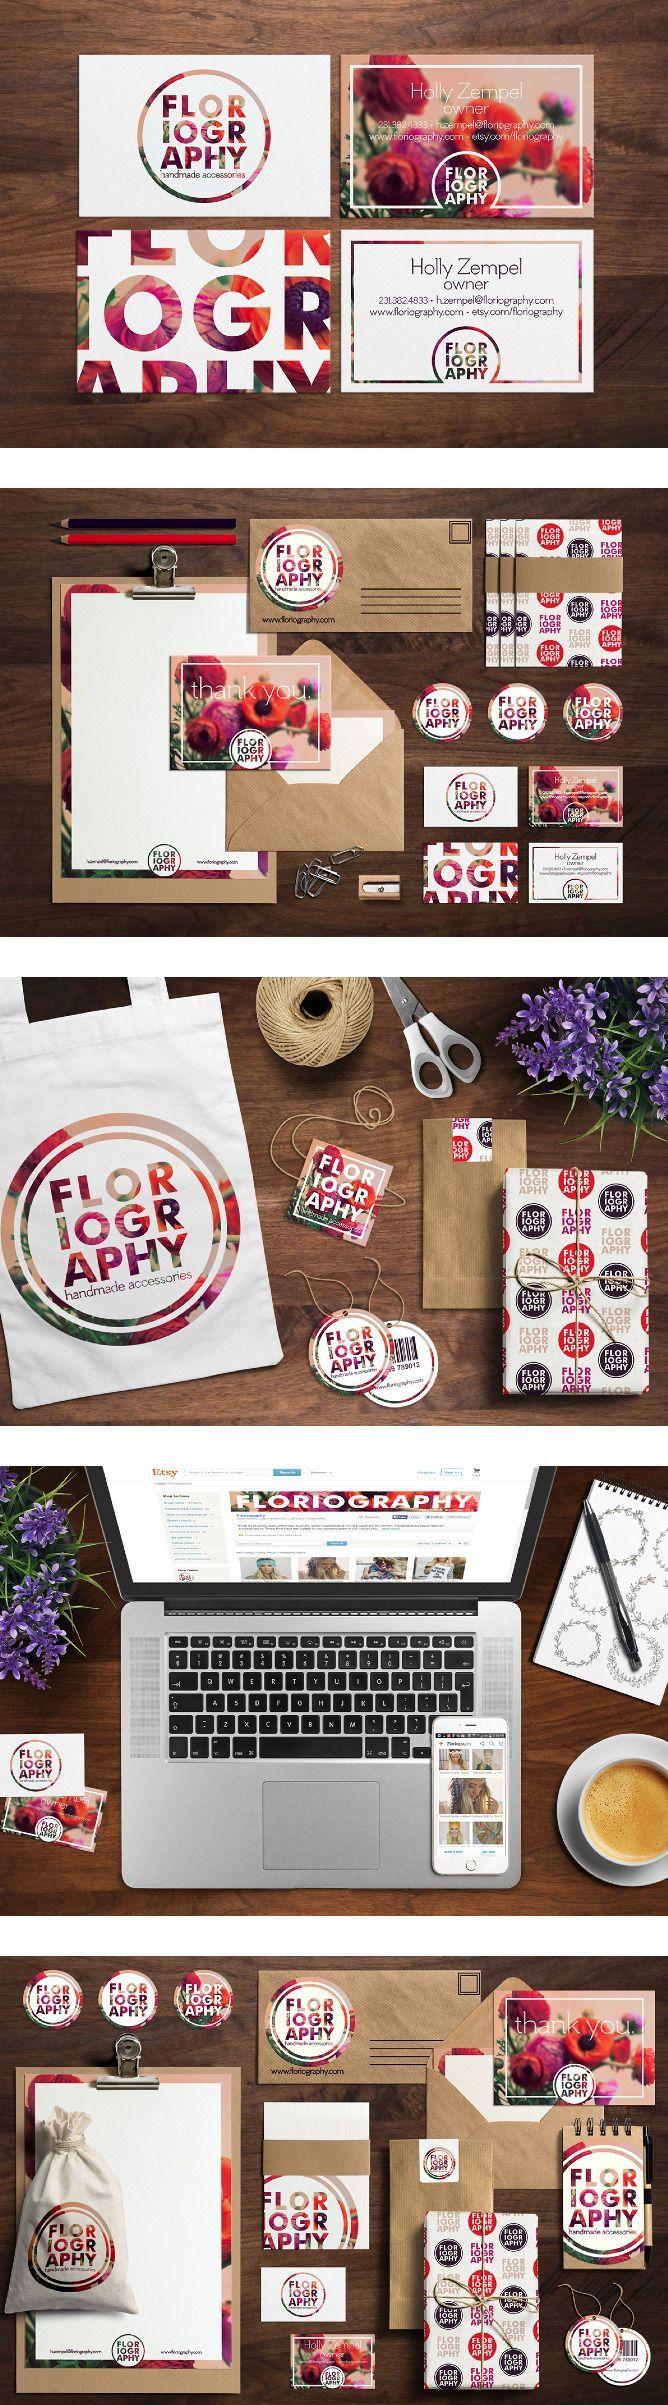 Floriography Branding